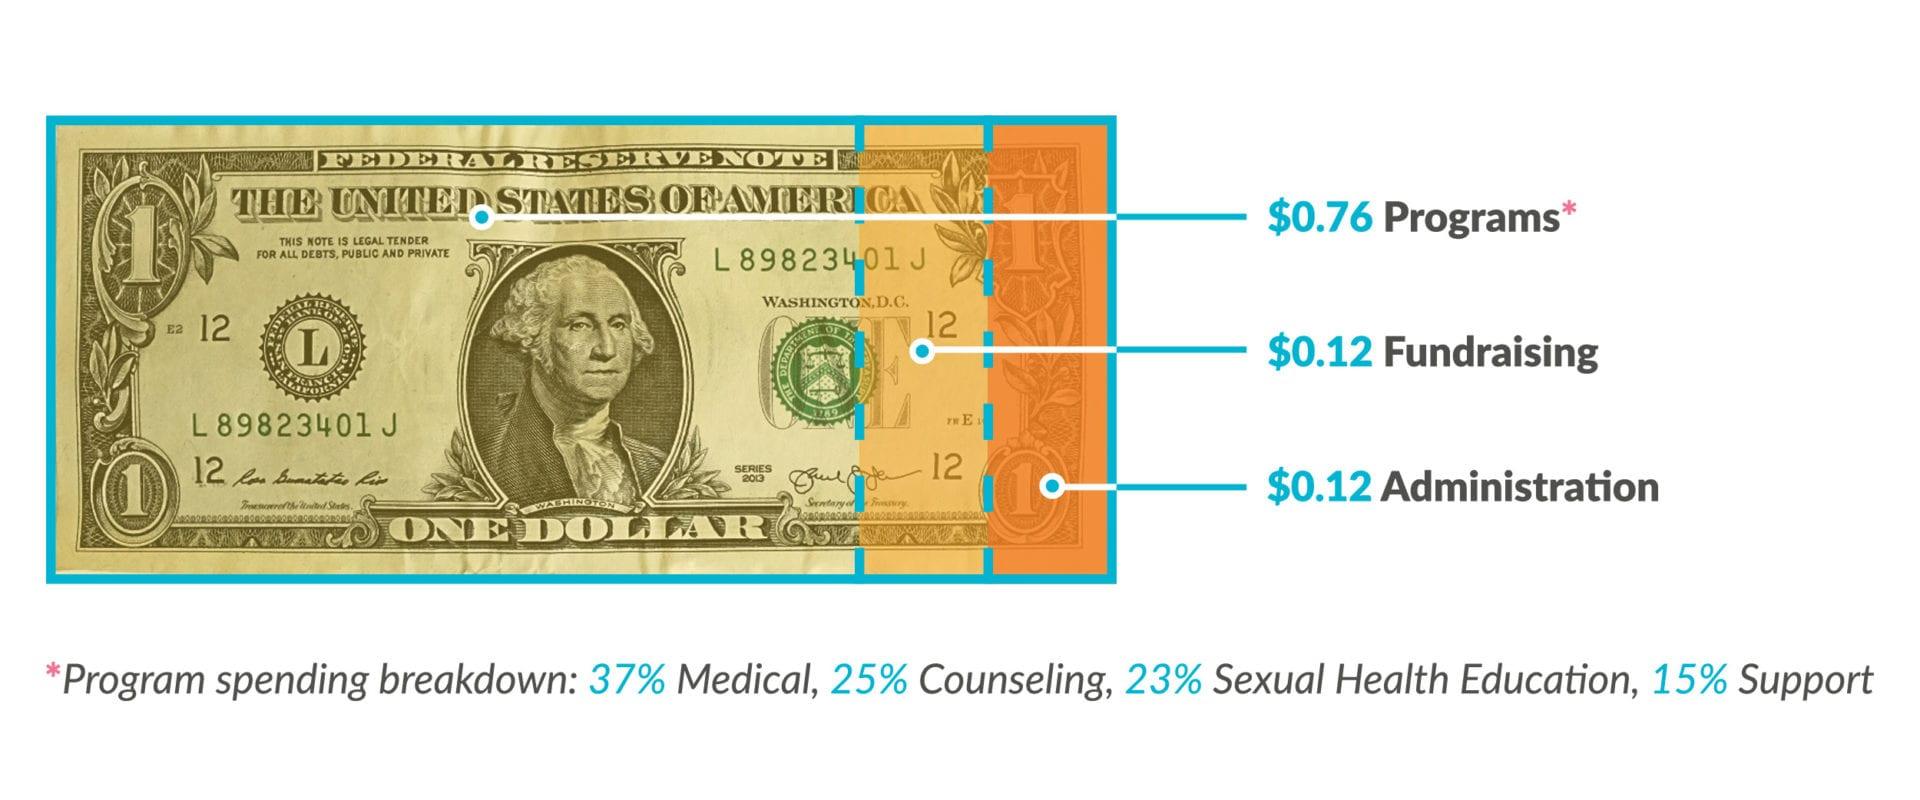 Breakdown of spending using a dollar bill